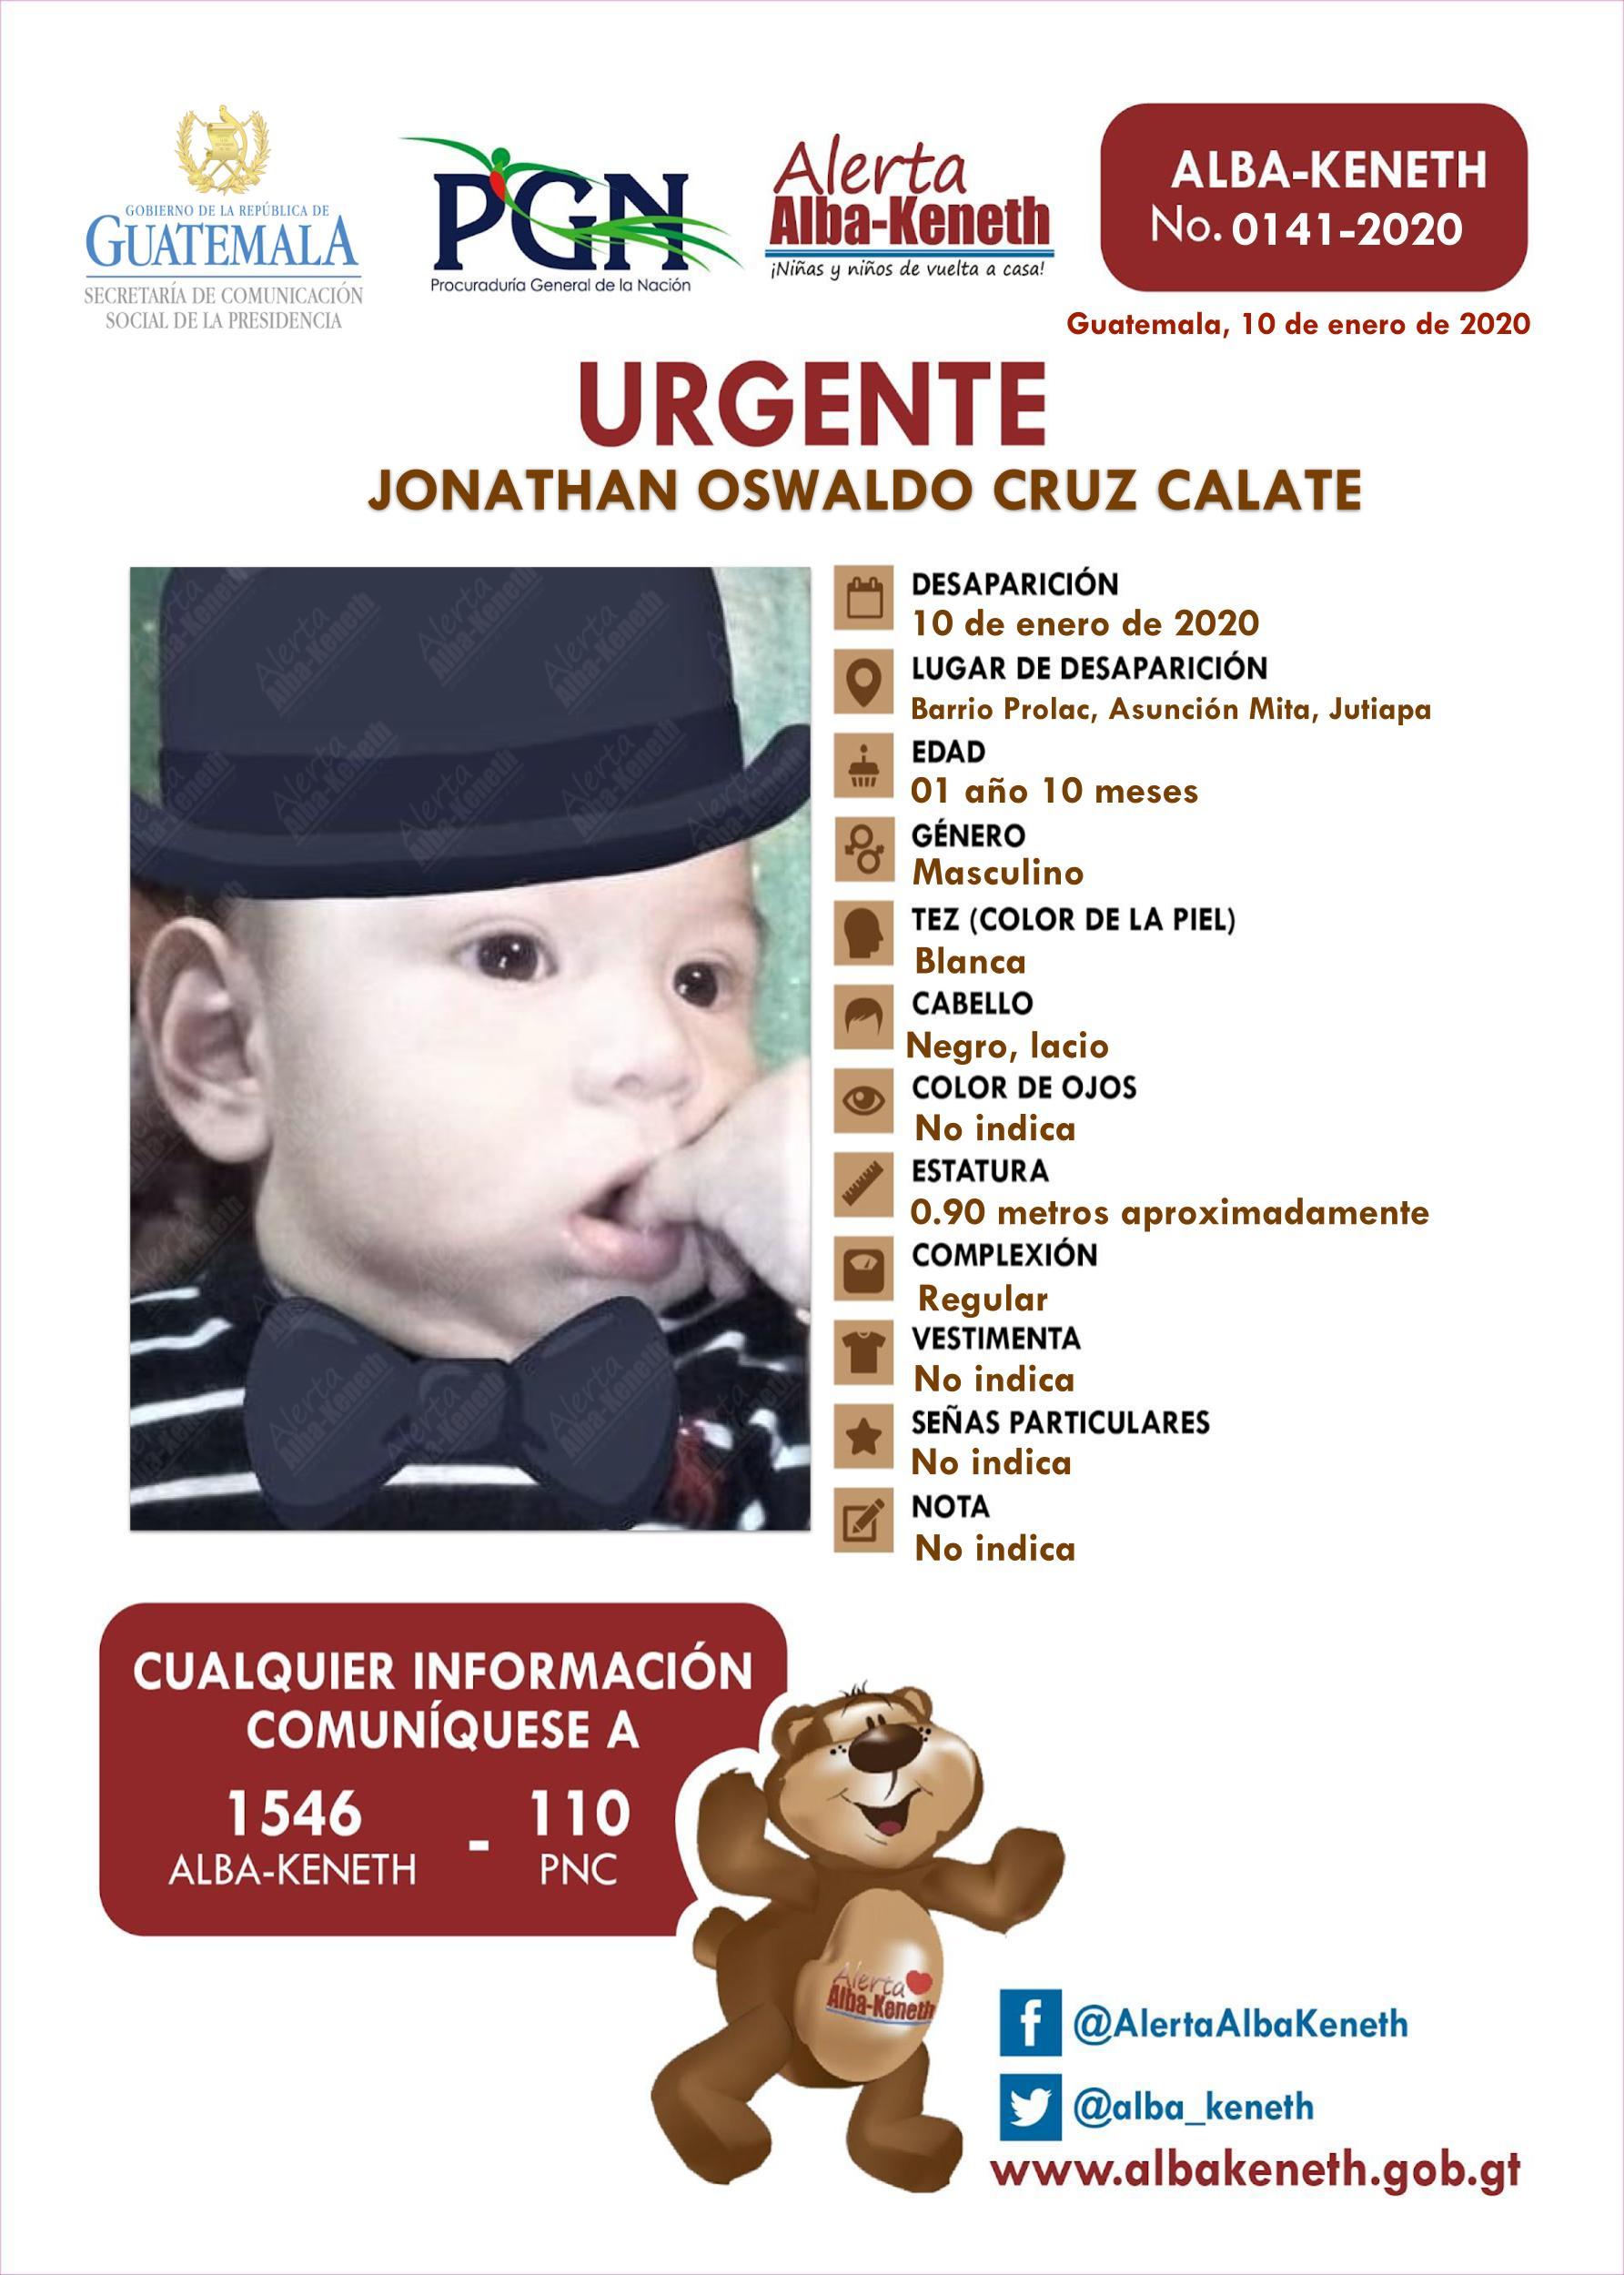 Jonathan Oswaldo Cruz Calate